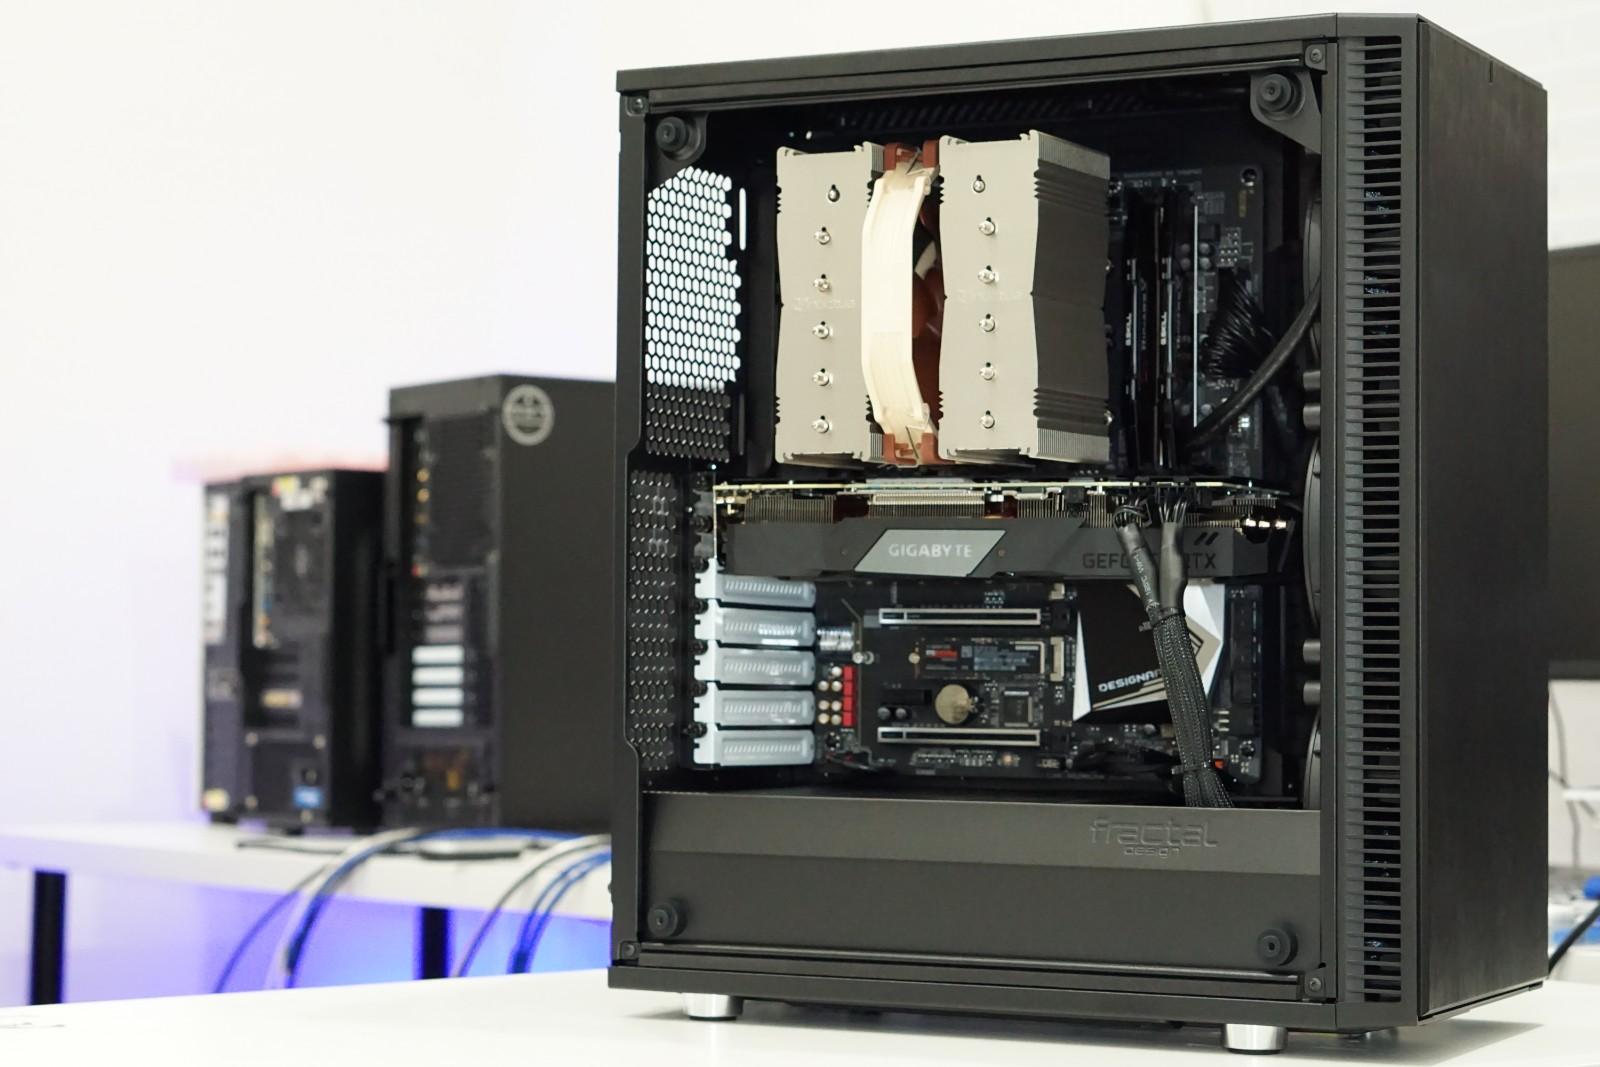 Popular Configuration - Case: Fractal Design Define CCPU: Intel i9 9900k w/Boost Clock Tune (BCT)Motherboard: Gigabyte z390 Designare ATXRAM: Corsair LPX 32GB 3200mhz (2x16GB)Video Card: Nvidia RTX 2060 SUPER 8GBCPU Cooler: Be Quiet! Dark Rock Pro 4Storage: Samsung 970 Evo Plus 1TBPower Supply: EVGA G3 750watt GoldOperating System: Windows 10 PRO 64bitPRICE: $3543 + Shipping & Tax(Other Configurations available)